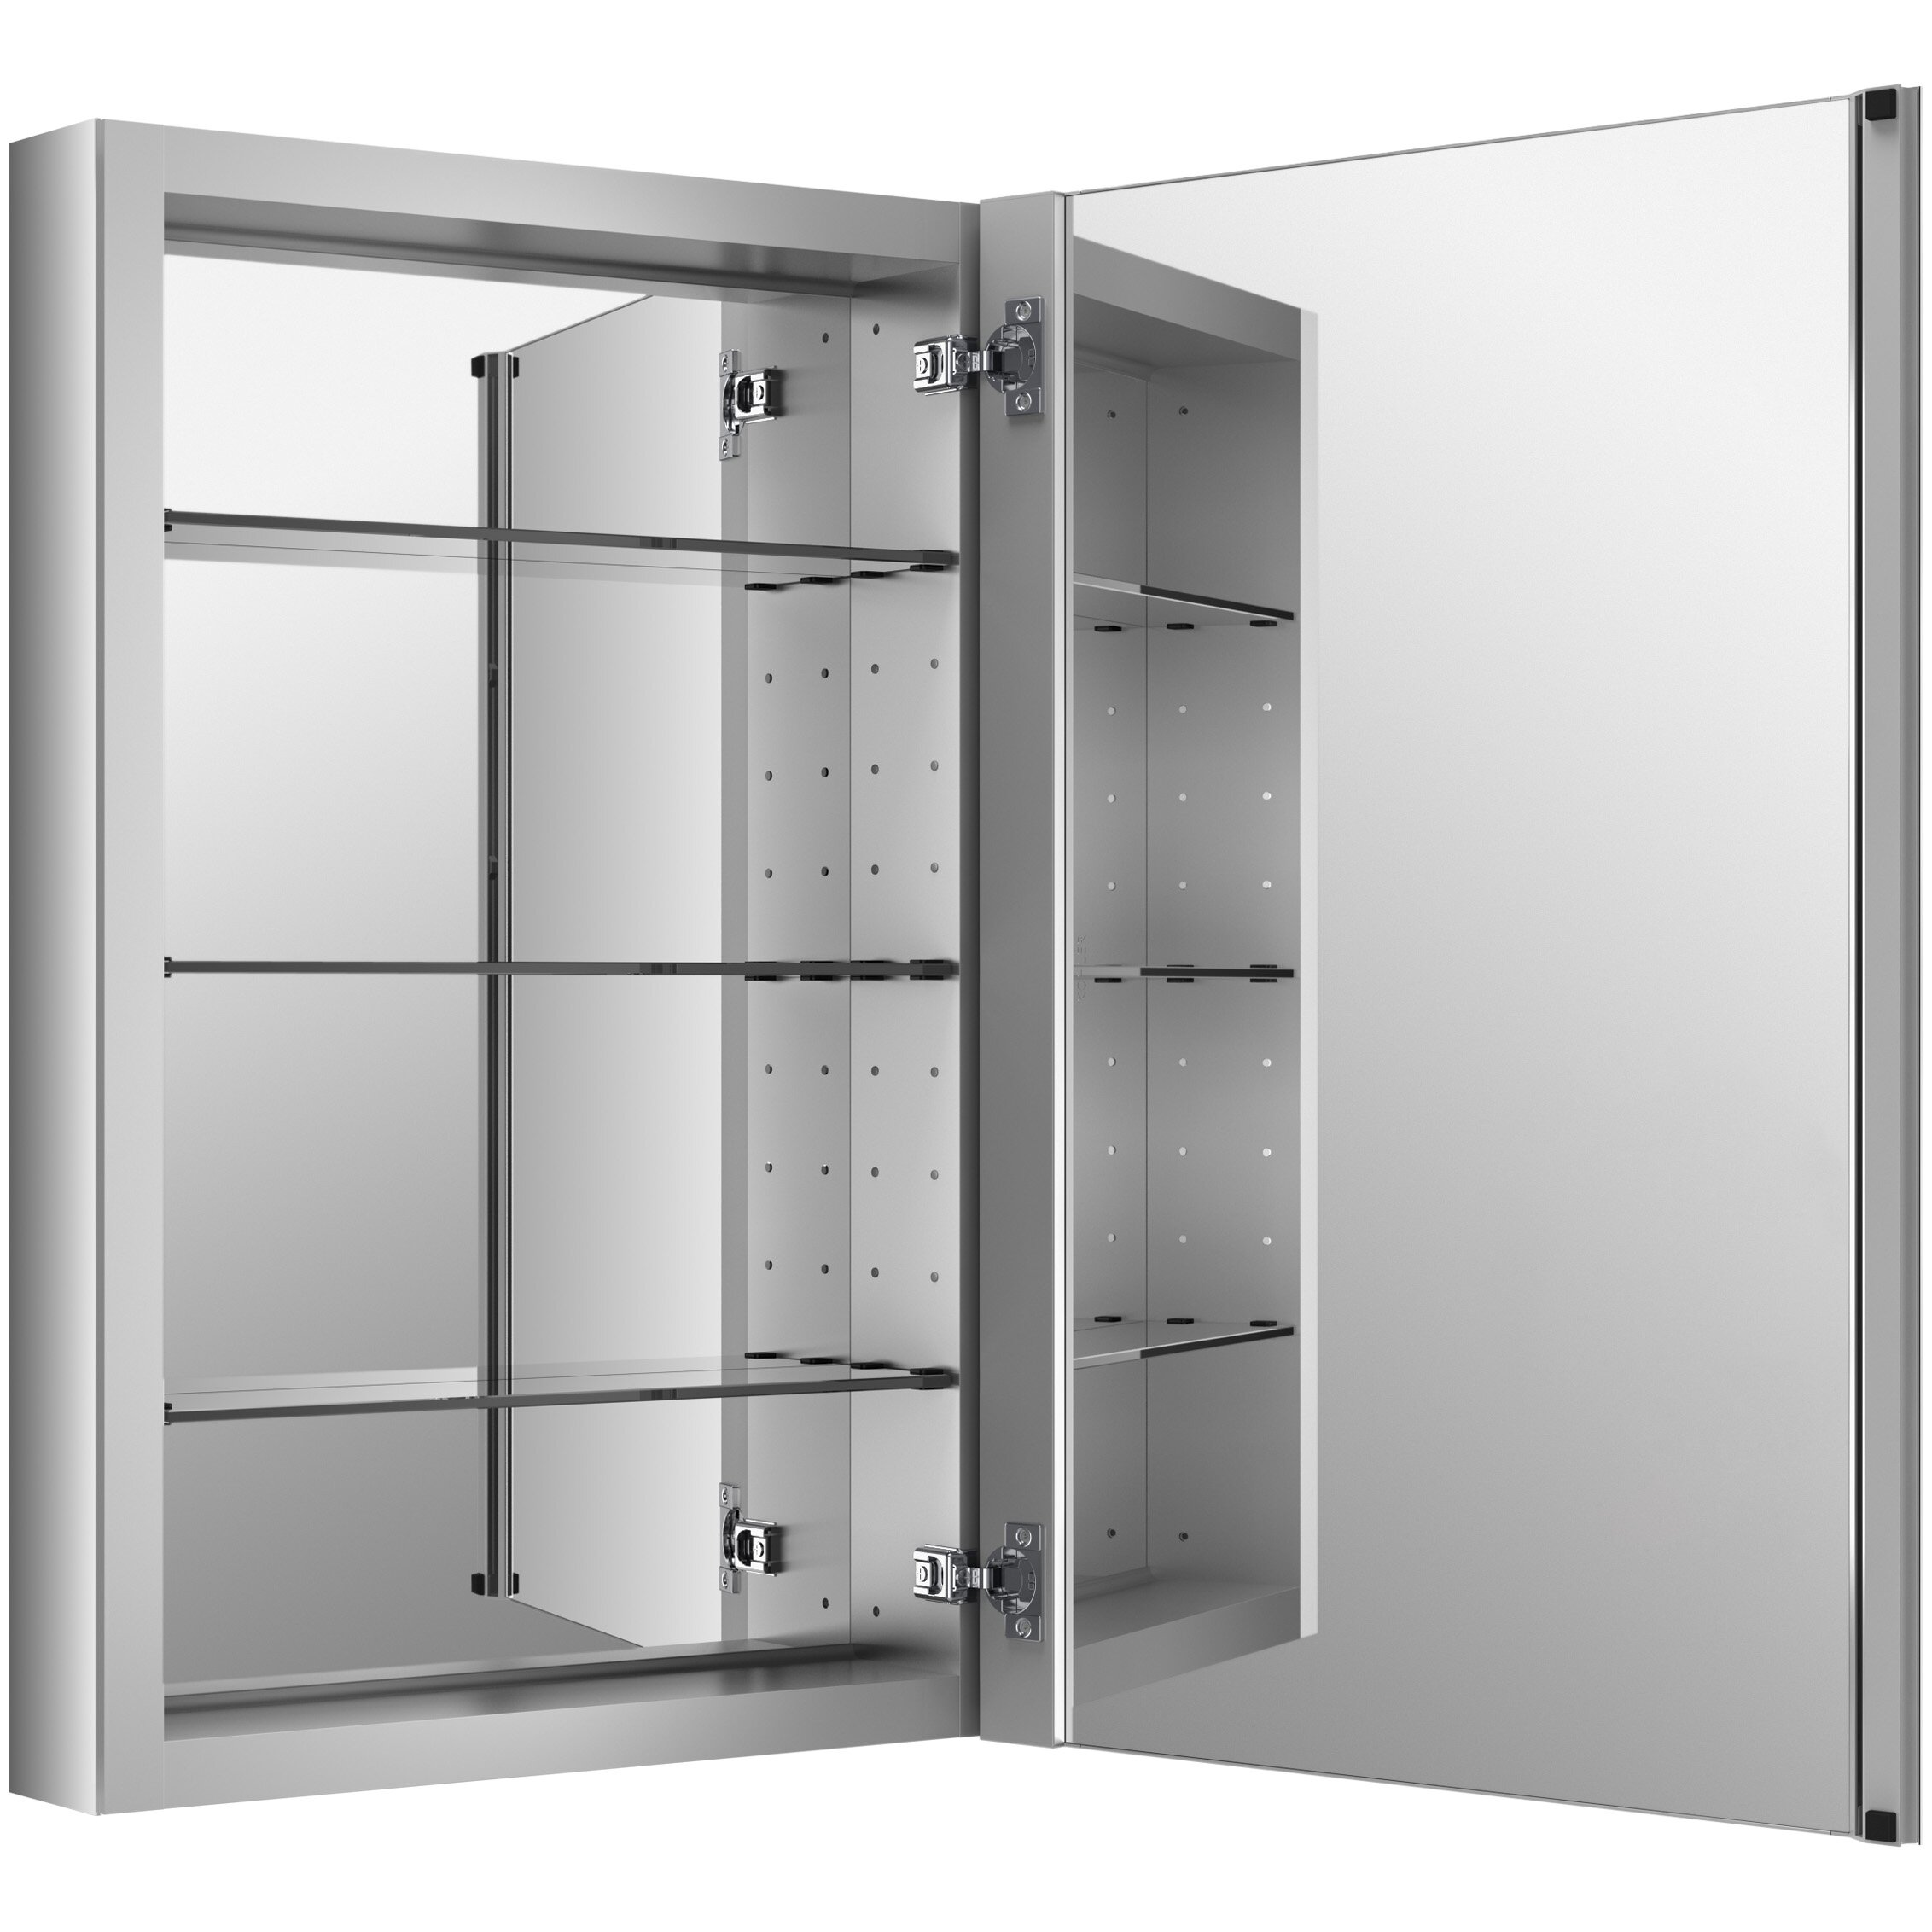 Horizontal Medicine Cabinet Kohler Verdera 20 X 30 Aluminum Medicine Cabinet Reviews Wayfair